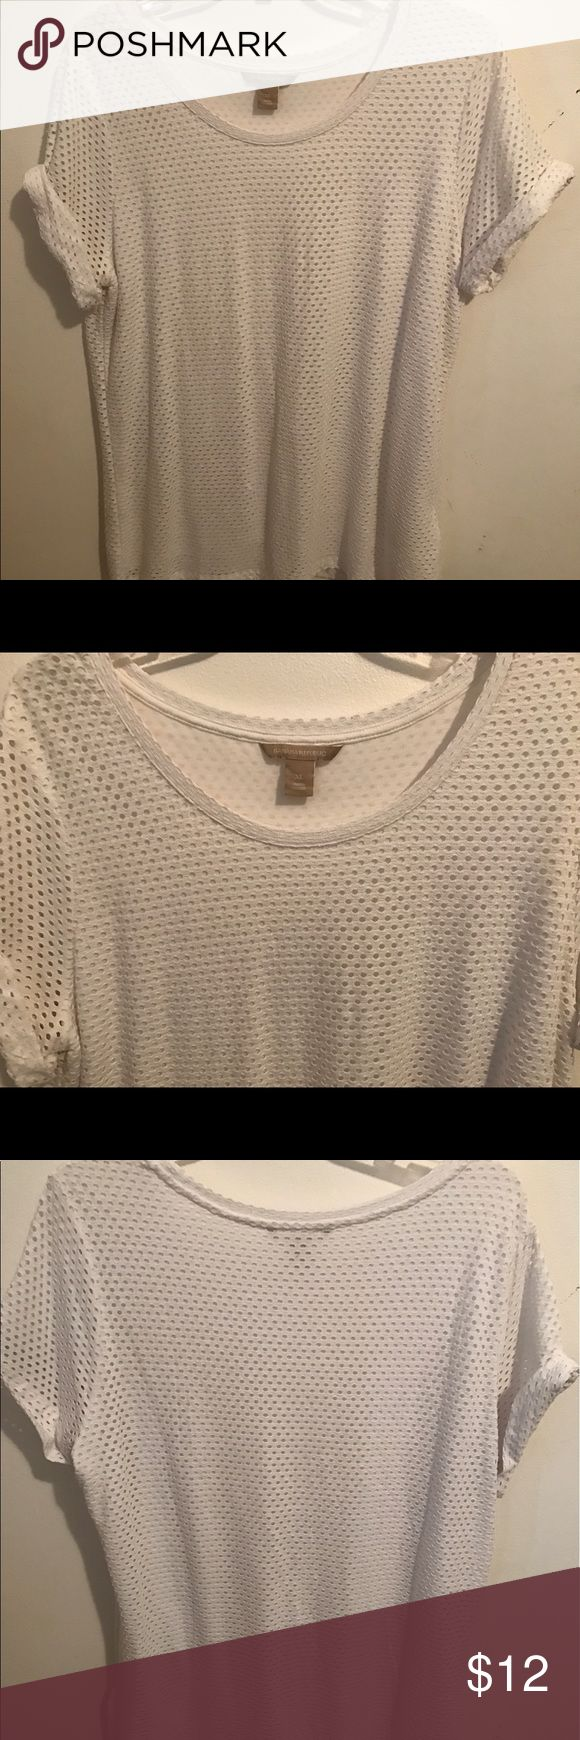 Banana Republic white tshirt size XL Banana Republic white lined tshirt size XL, only worn once Banana Republic Tops Tees - Short Sleeve